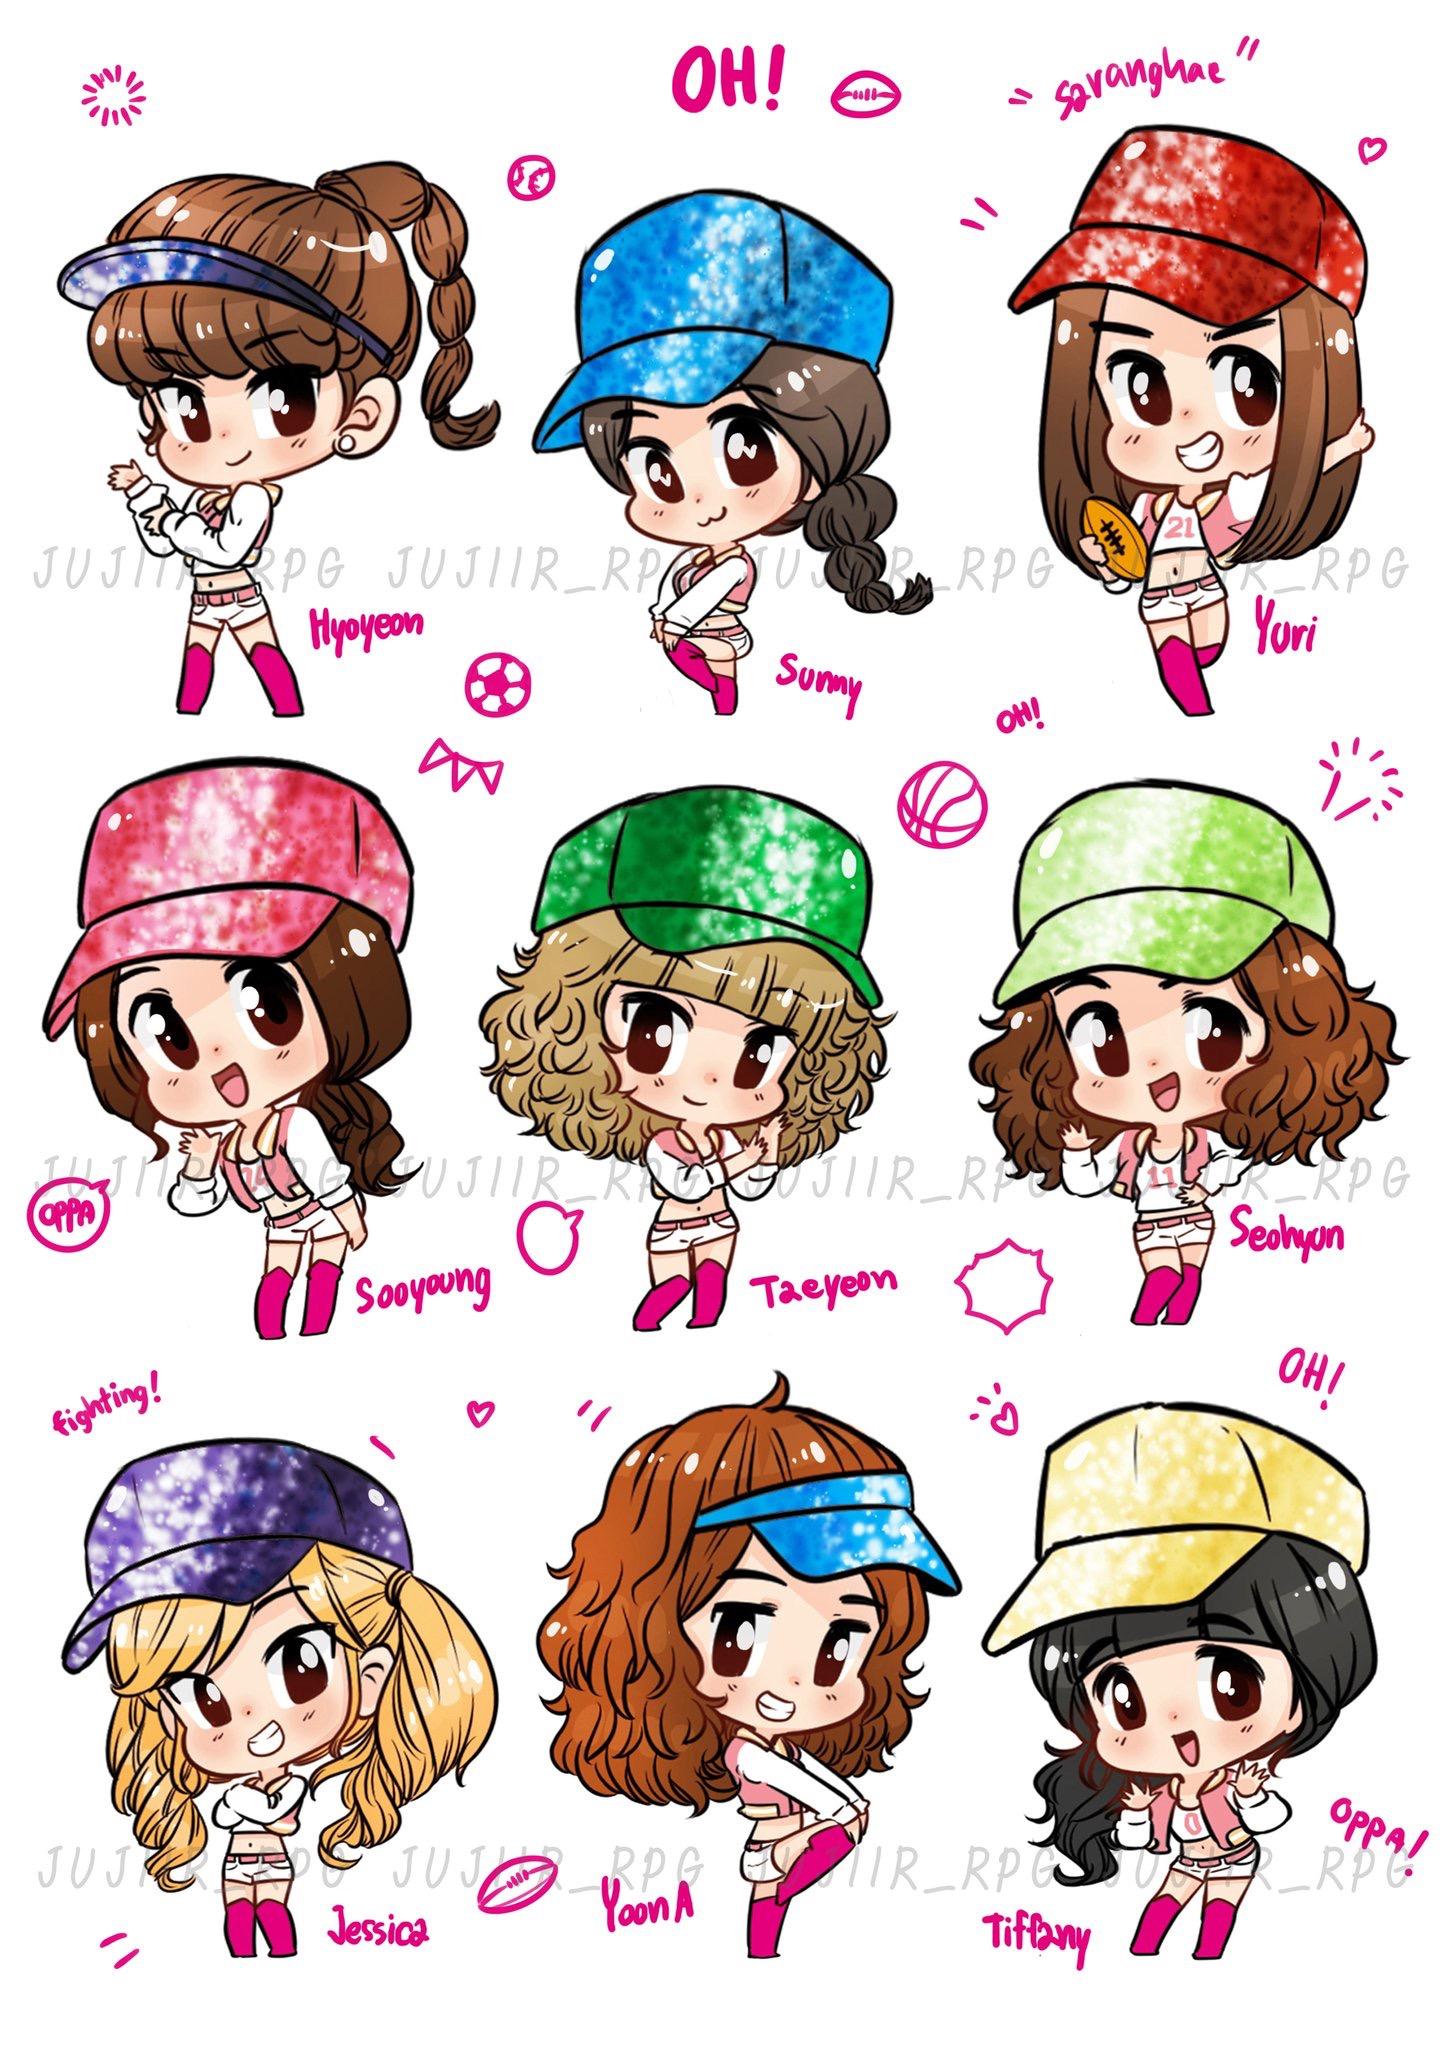 Kpop Girl Groups, Kpop Girls, Snsd Tiffany, Girls Generation, Chibi,  Fanart, Skottie Young, 10 Anniversary, Sooyoung